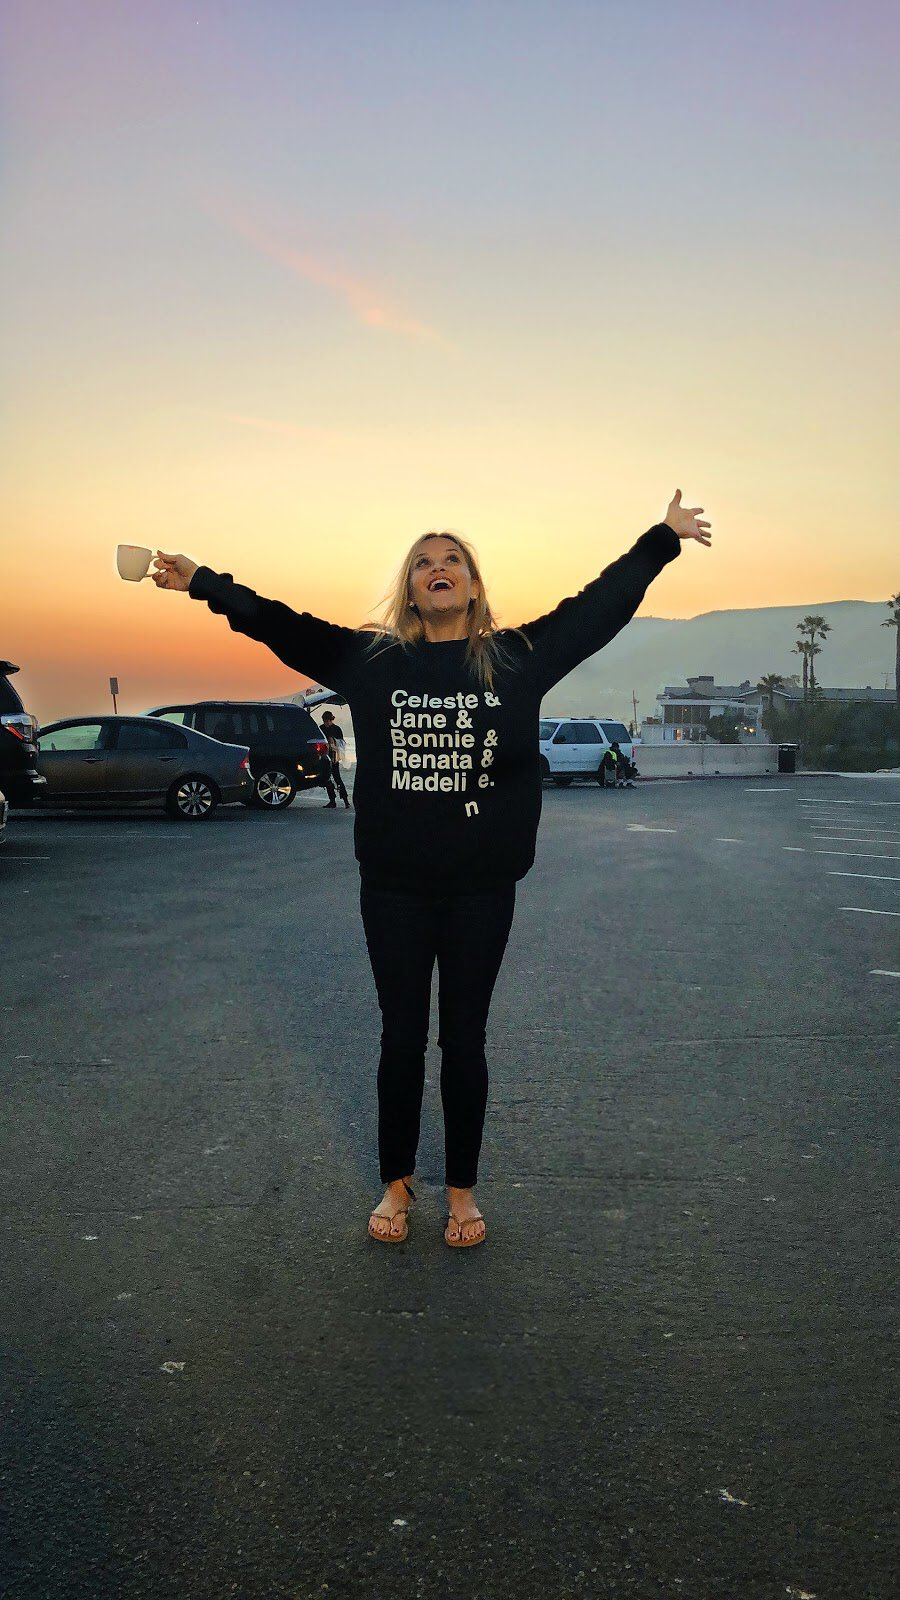 Beautiful sunset on set of #BigLittleLies! Feeling grateful! #TGIF https://t.co/leWFzSU7Rh